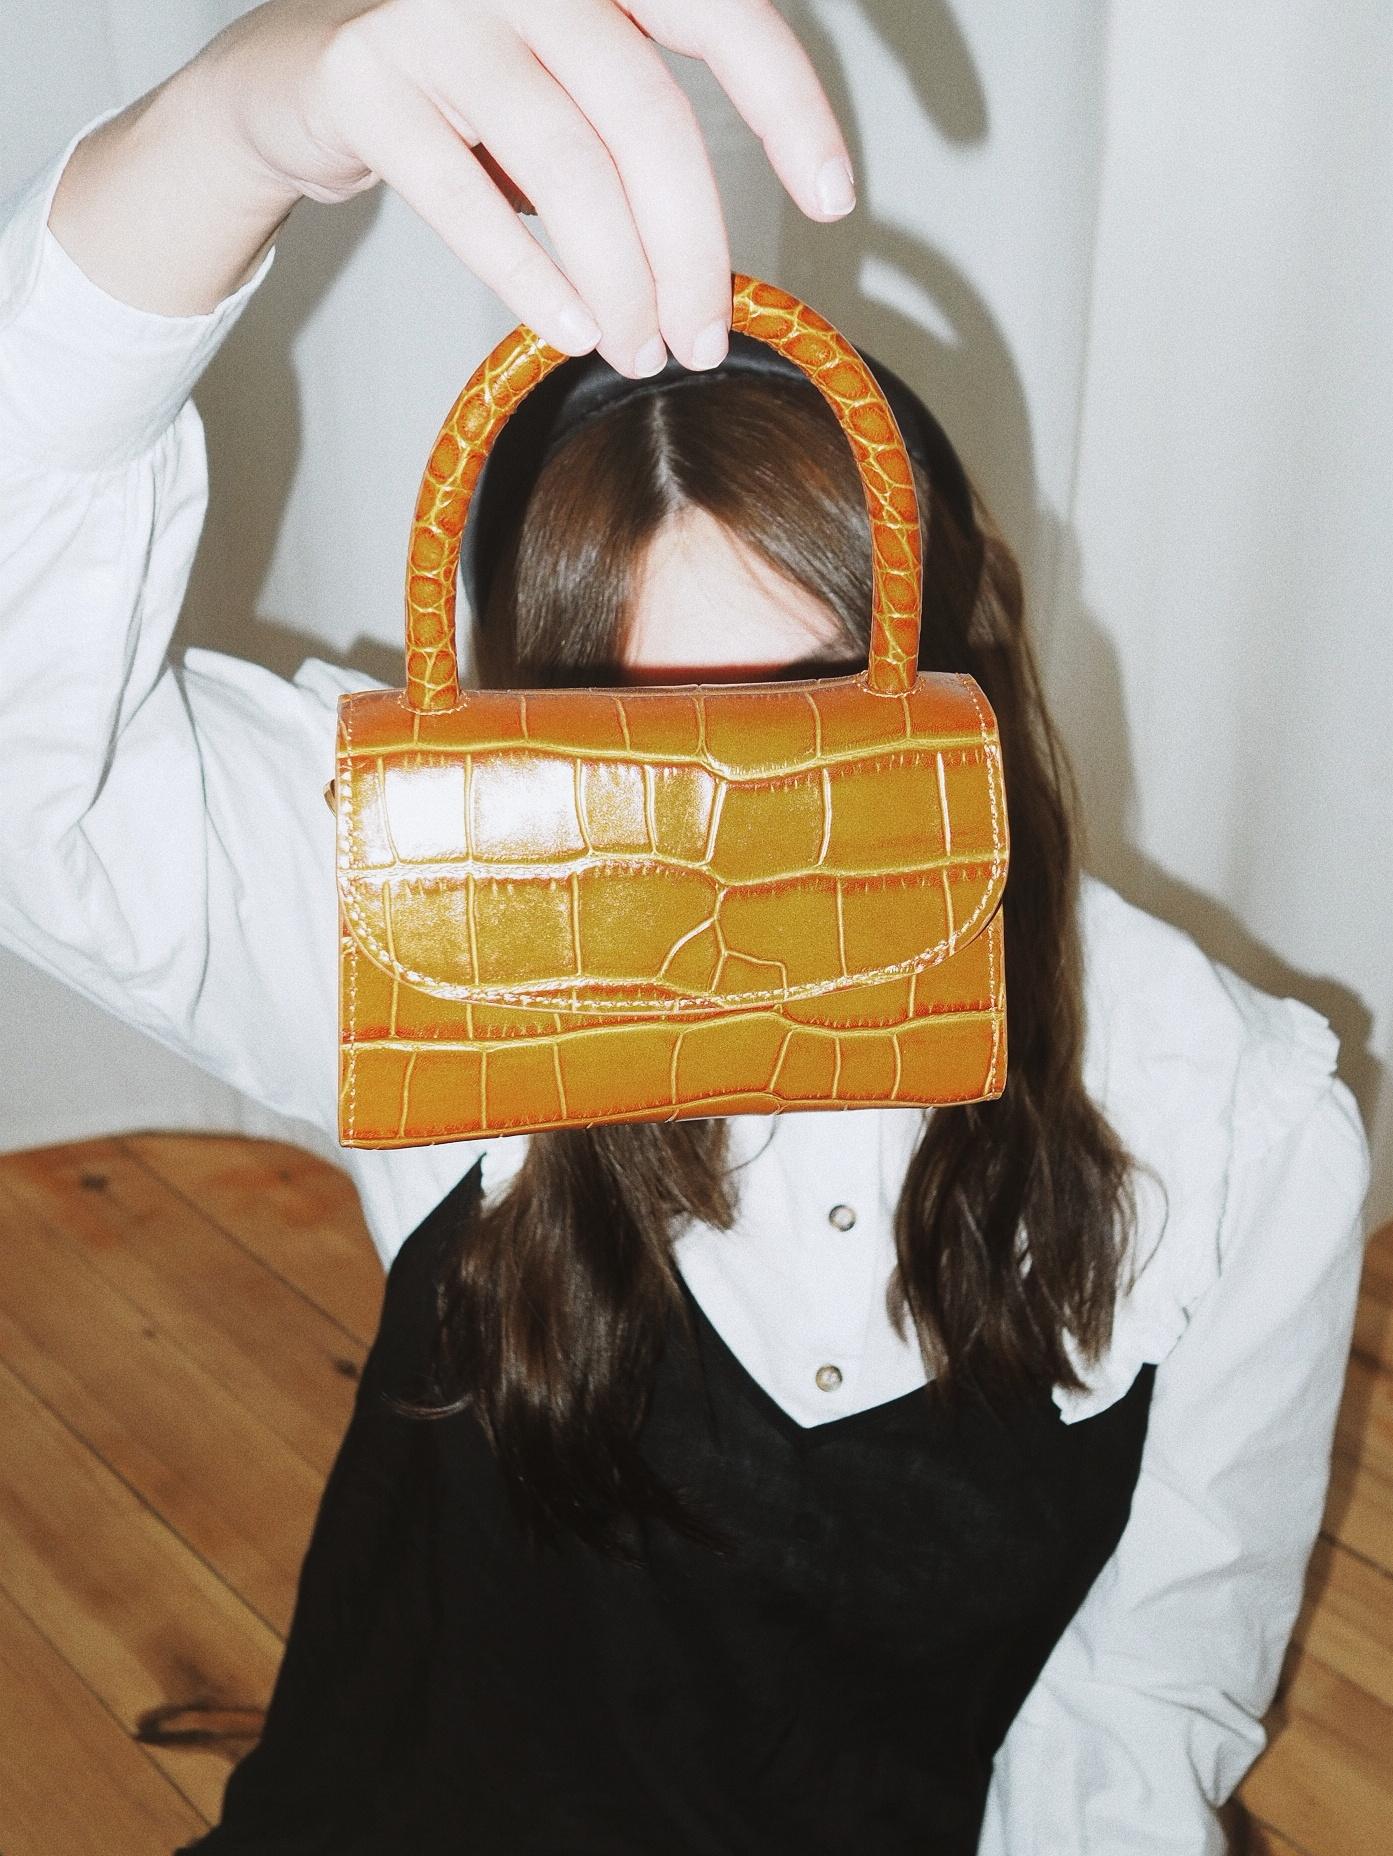 tiny-bag-by-far-julia-carevic